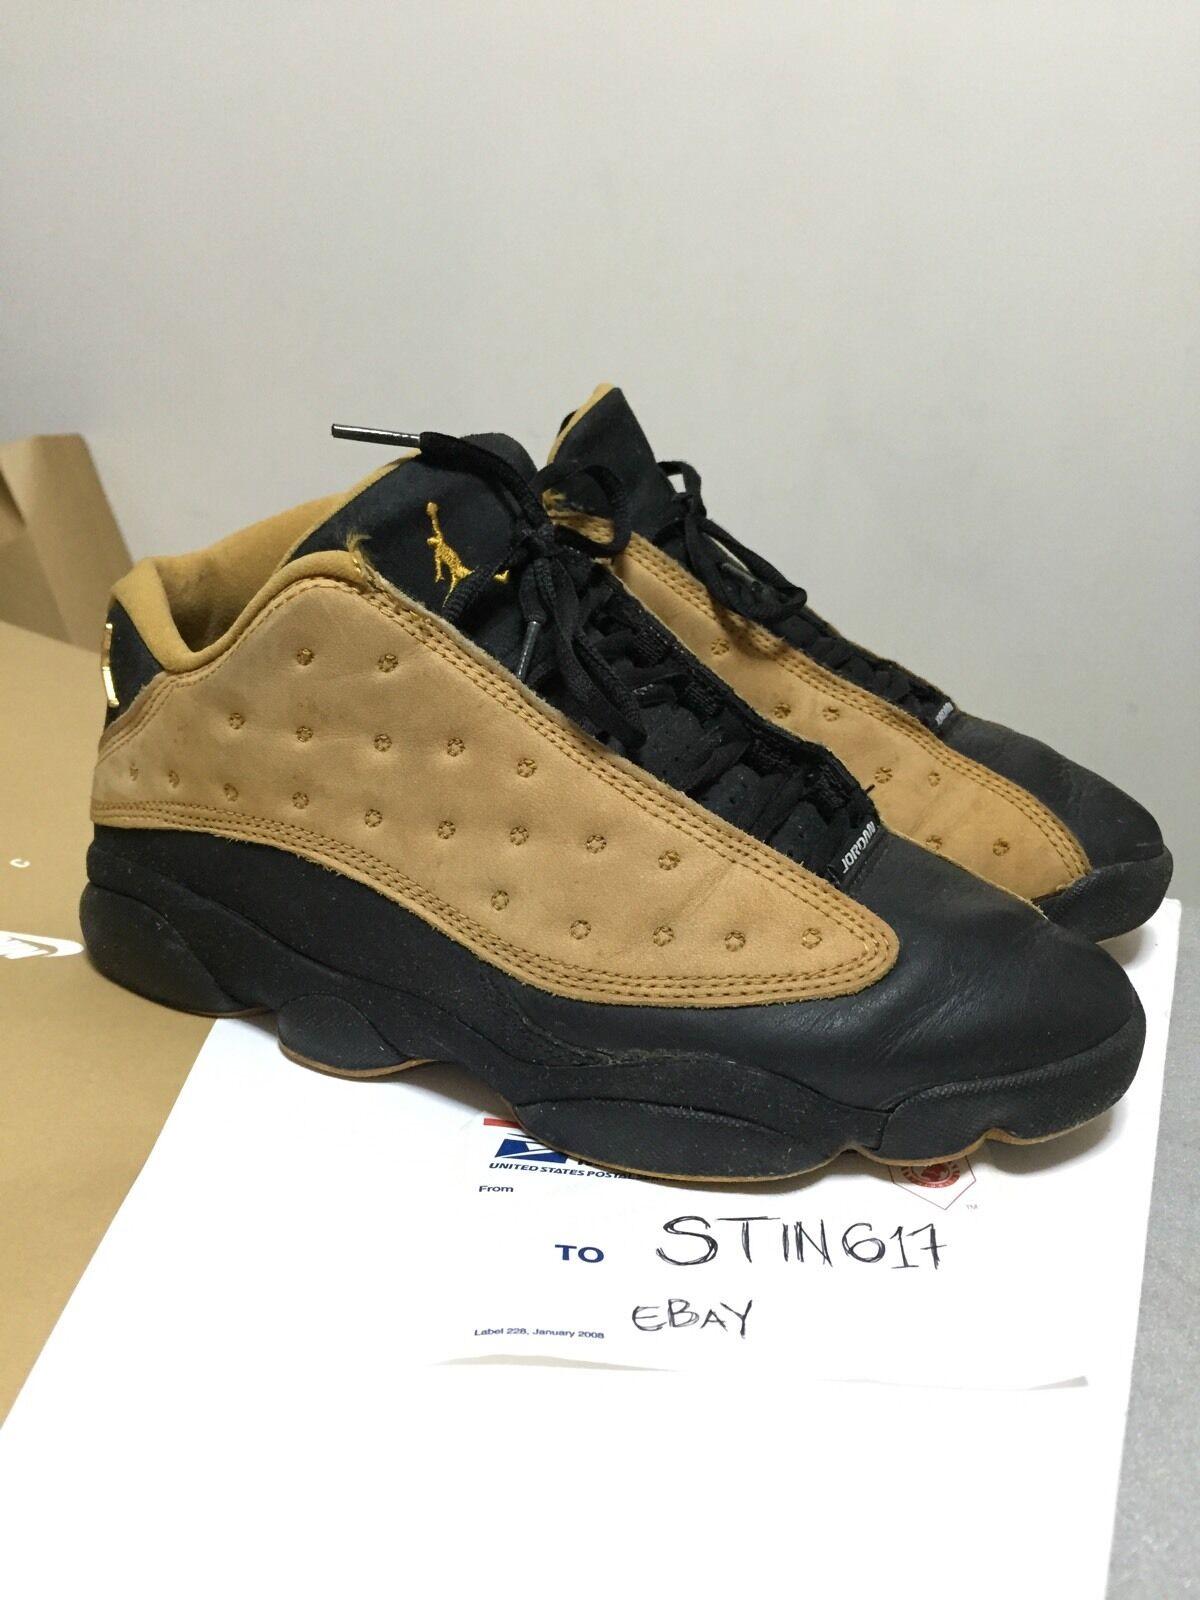 1998 OG Nike Air Jordan 13 XIII Low Black Chutney 8.5 he got game flint xi vi i Special limited time